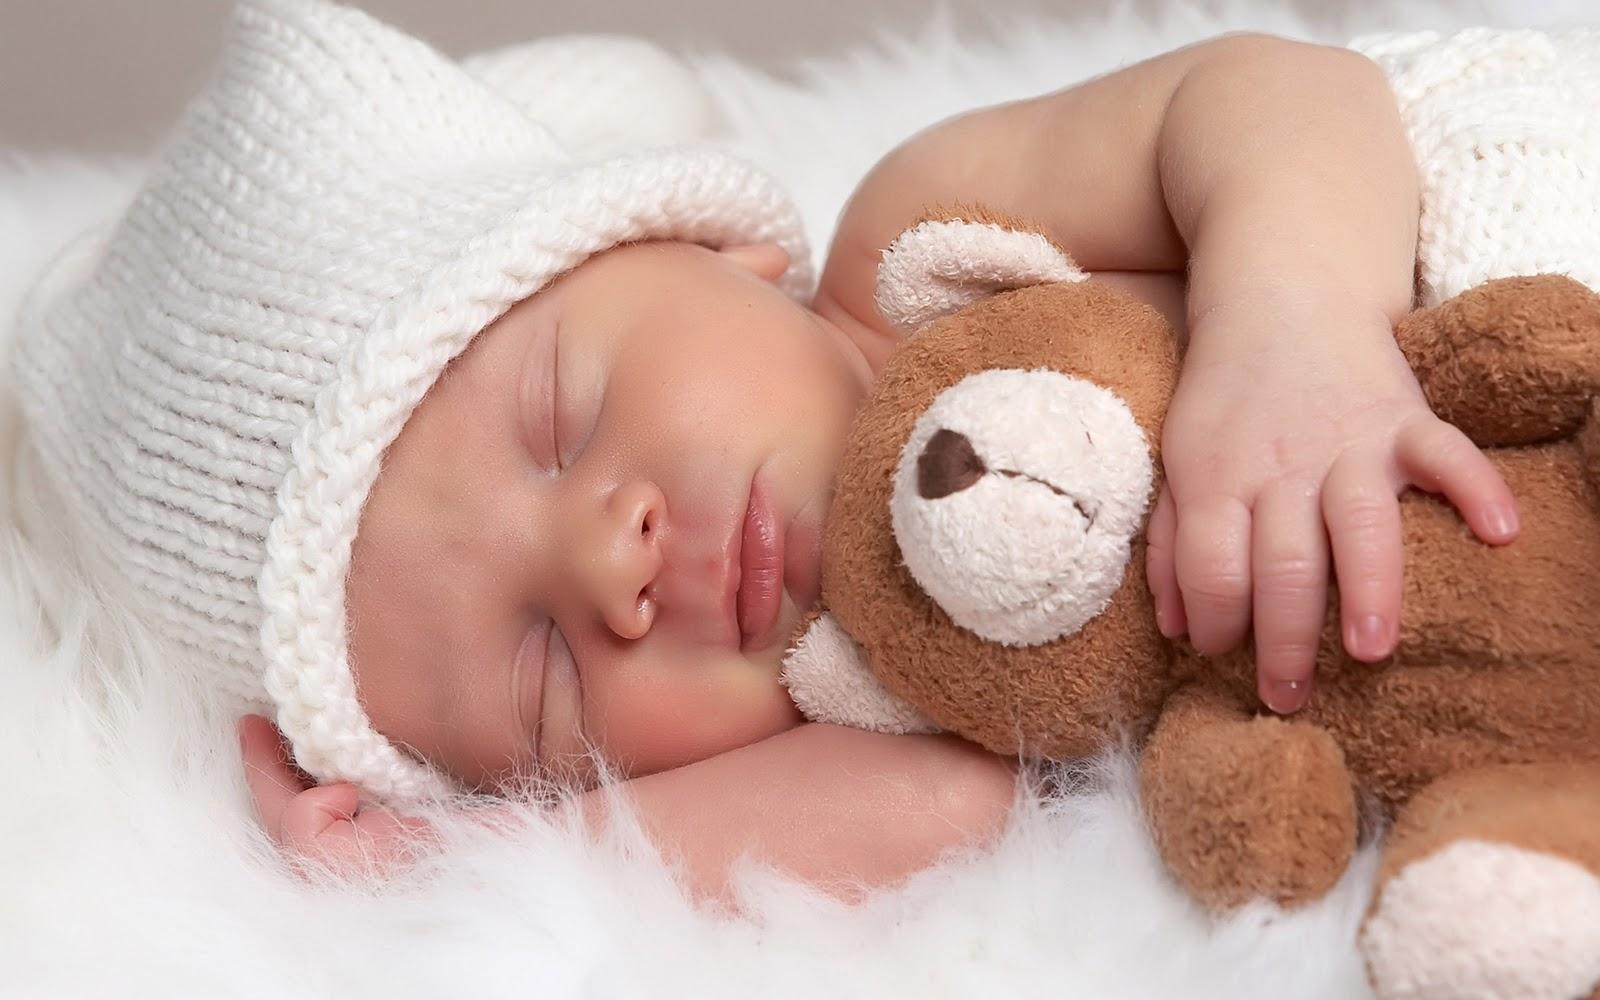 http://2.bp.blogspot.com/_aR7vf4Lt9ME/TM_t9KpahiI/AAAAAAAAAhc/2Ic7mkmcXiU/s1600/baby-cute-wallpaper_2560x1600_84428.jpg